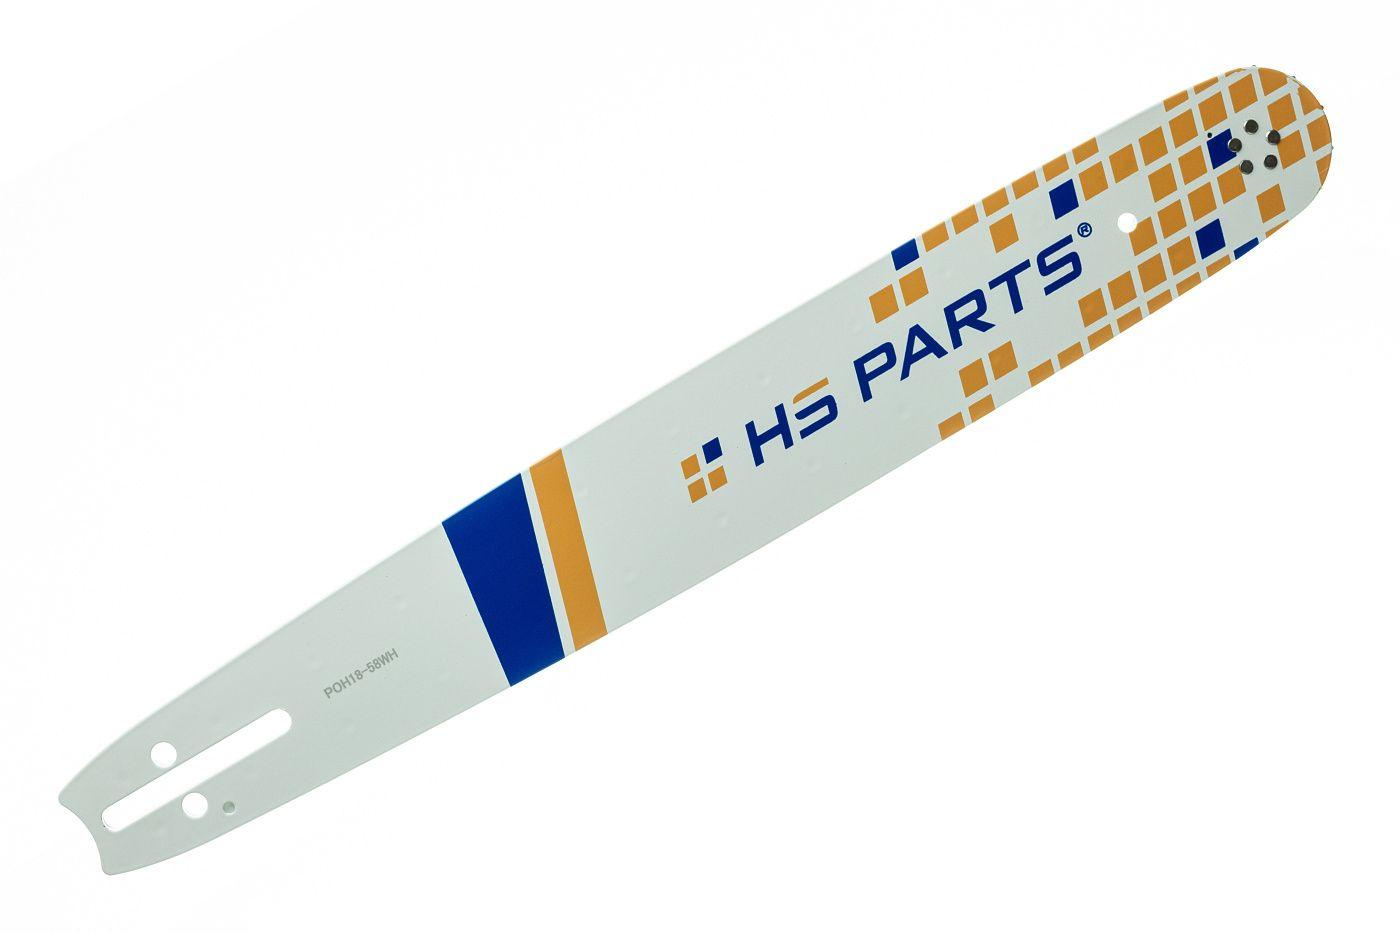 "HS PARTS Vodiaca líšta 18"" (45 cm) .325"" .058"" (1,5 mm)? 72 čl."